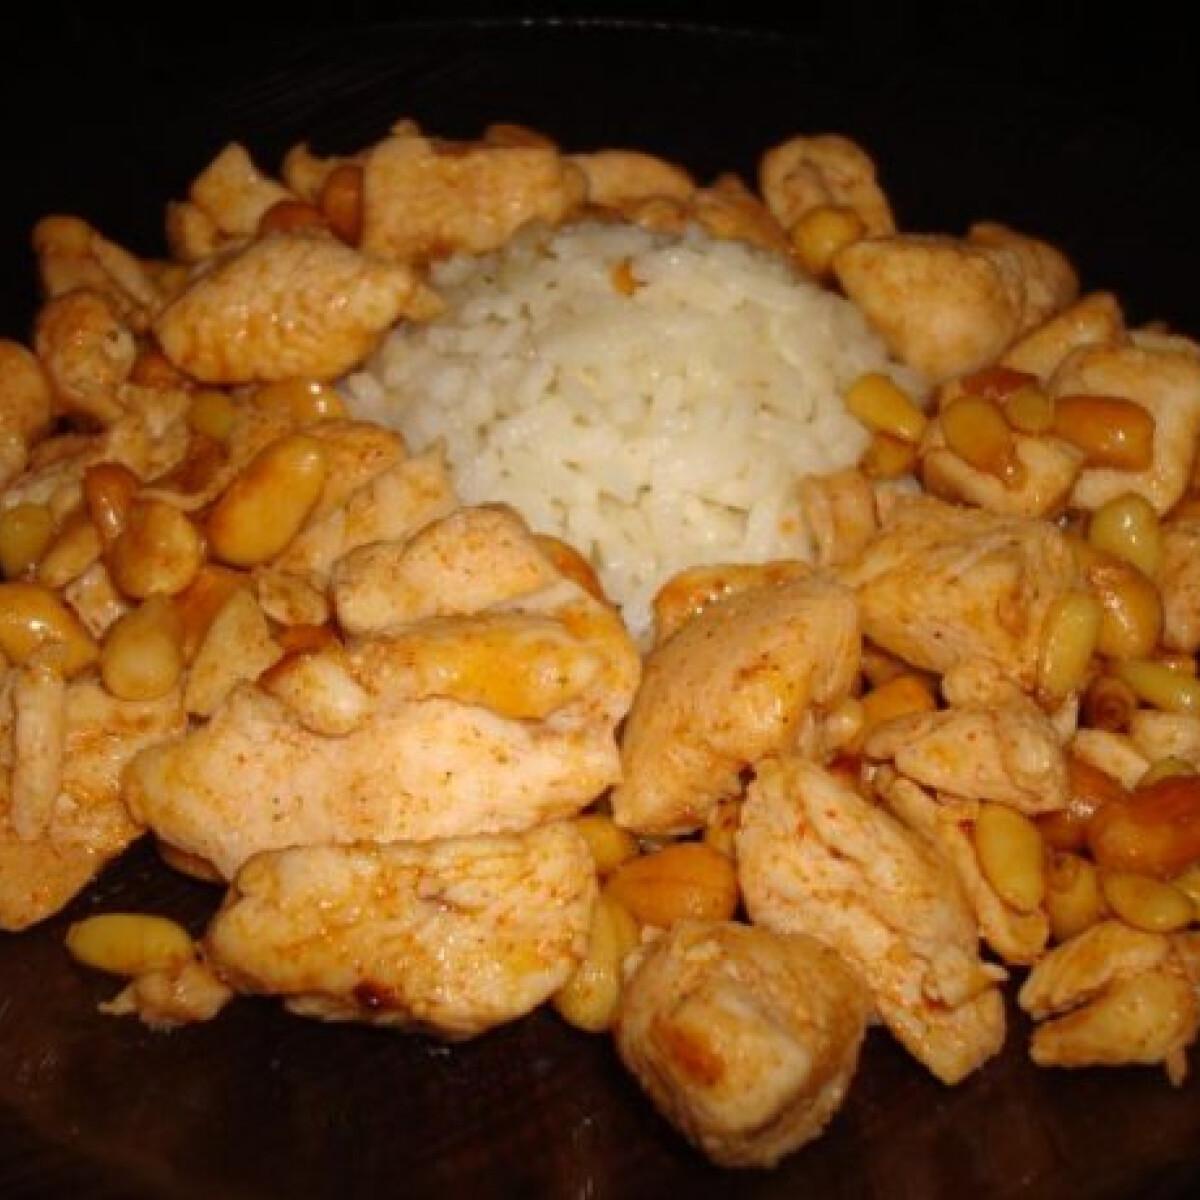 Orient magvas sült csirke